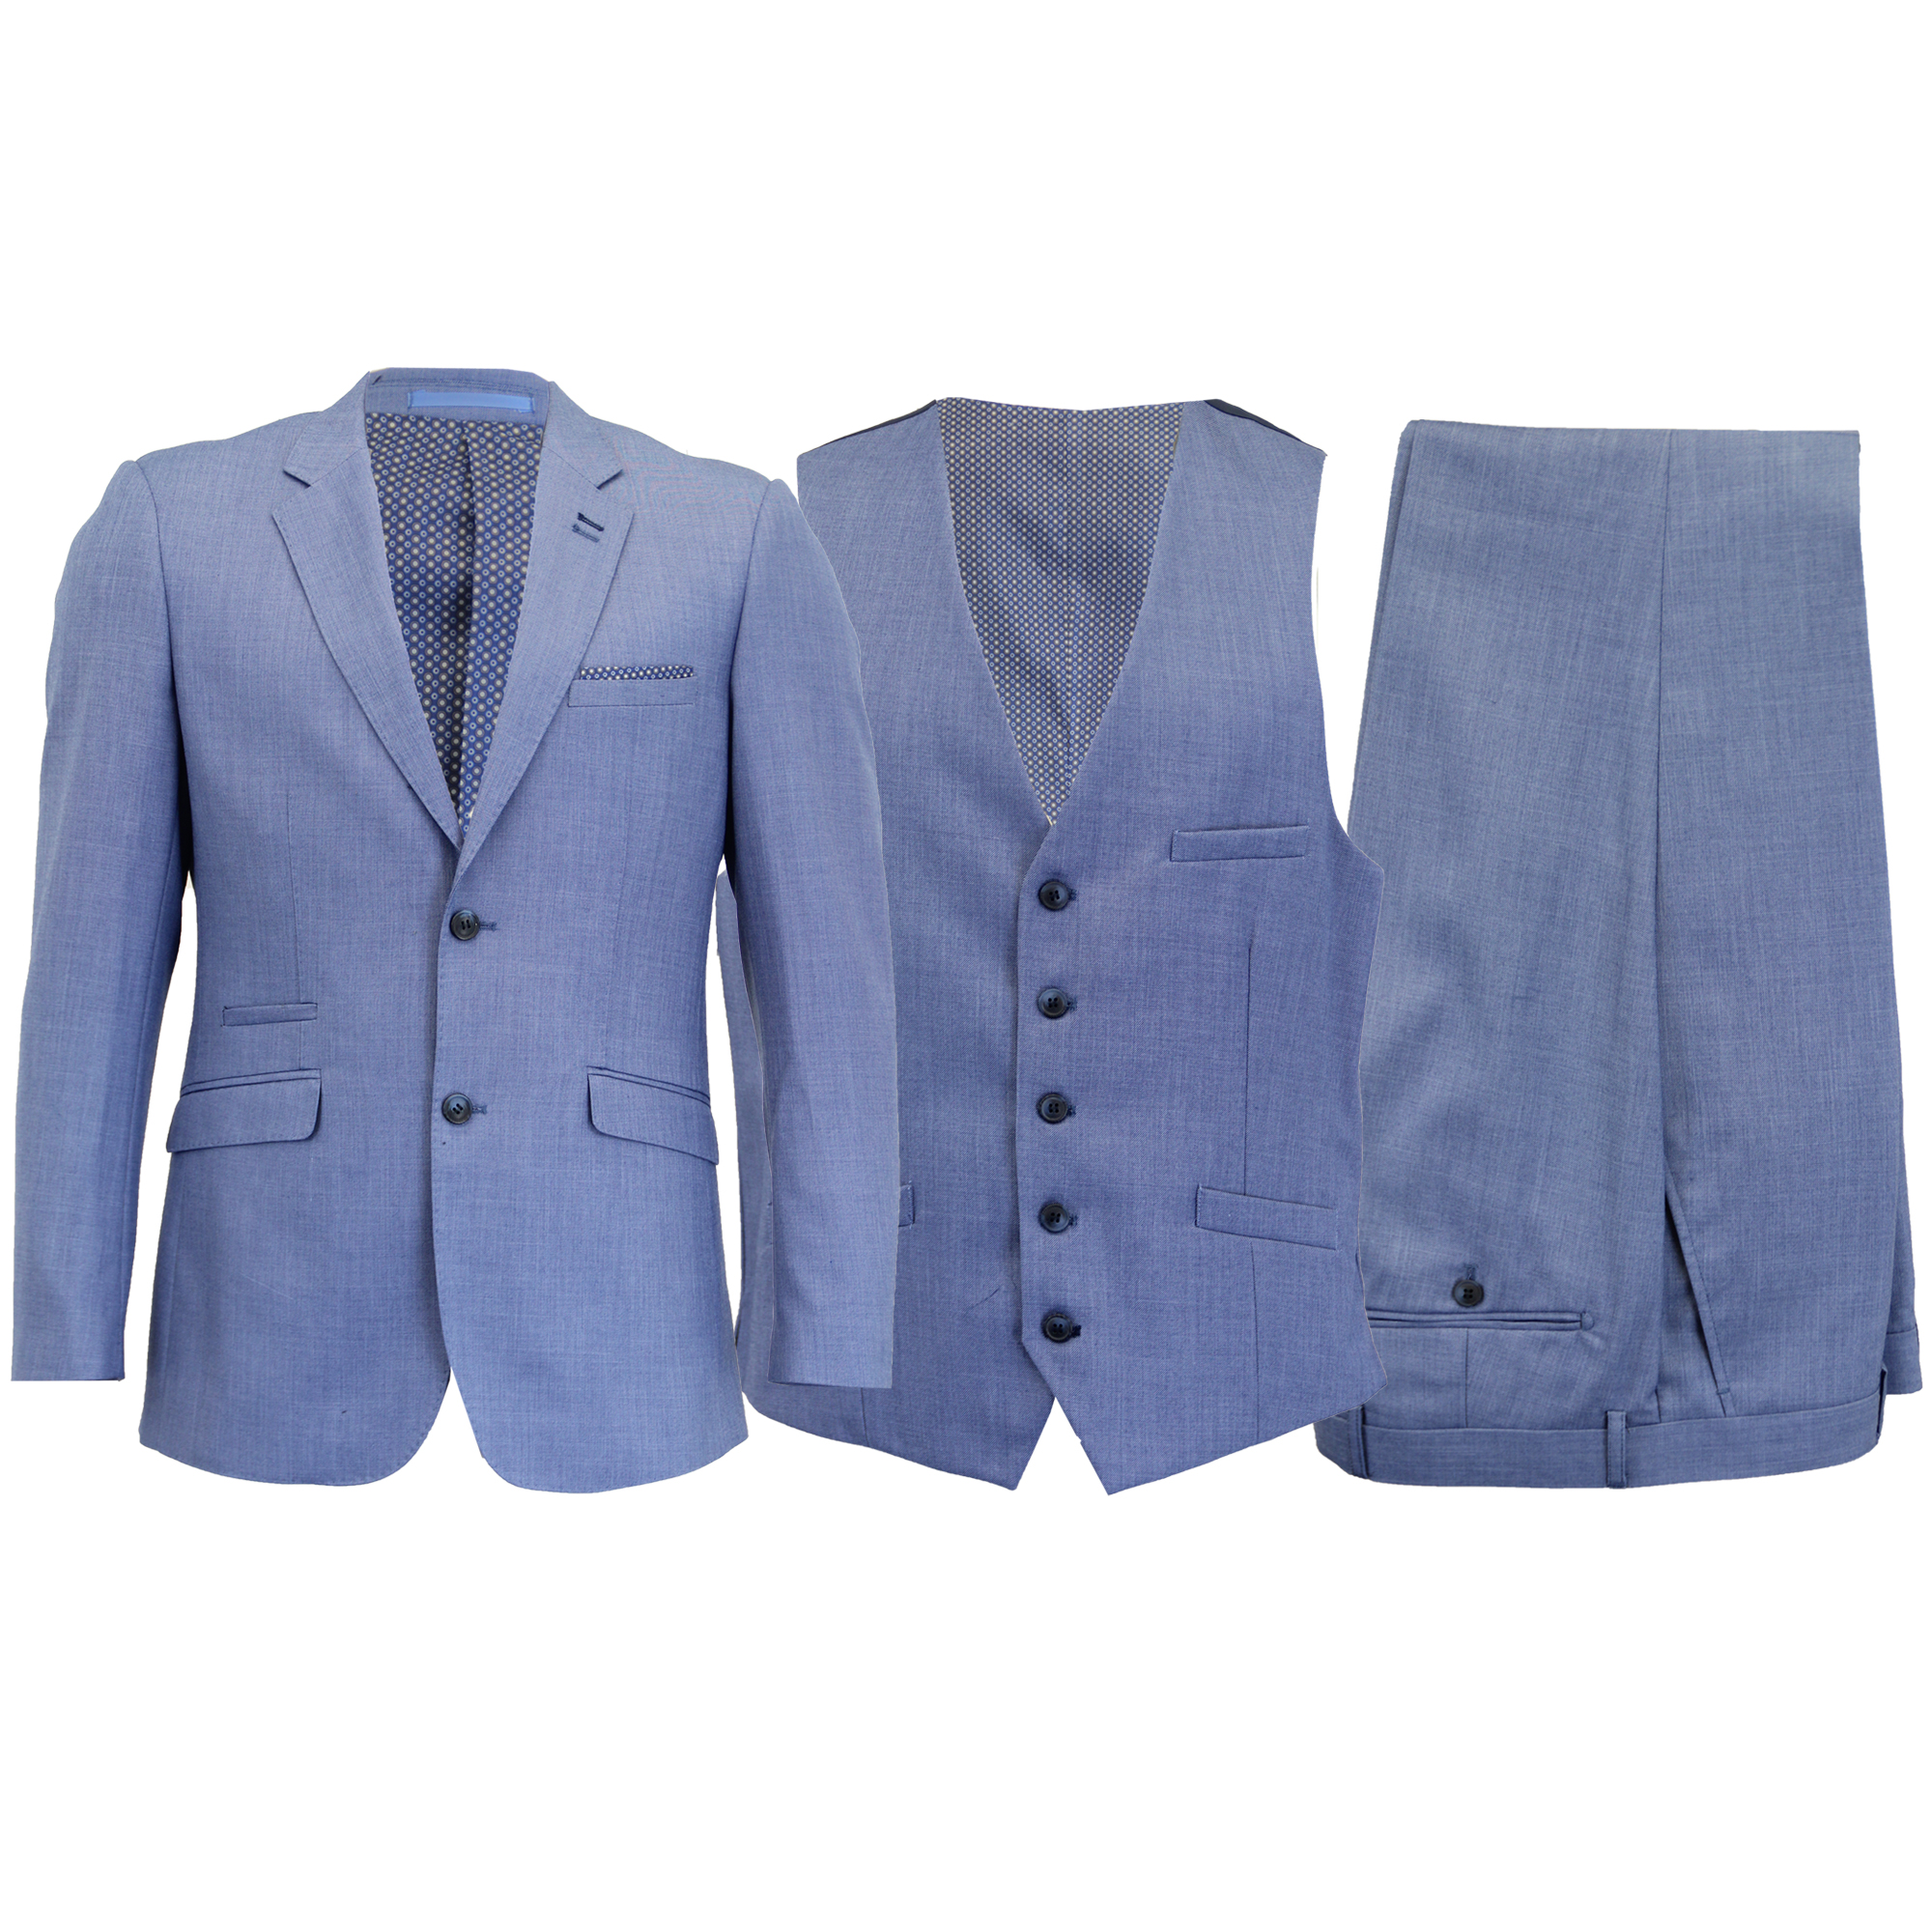 cd130b7a5b26 Details about Mens MARENO 3 Piece Suits Blazers Trouser Waistcoats Designer  Jacket Smart Prom